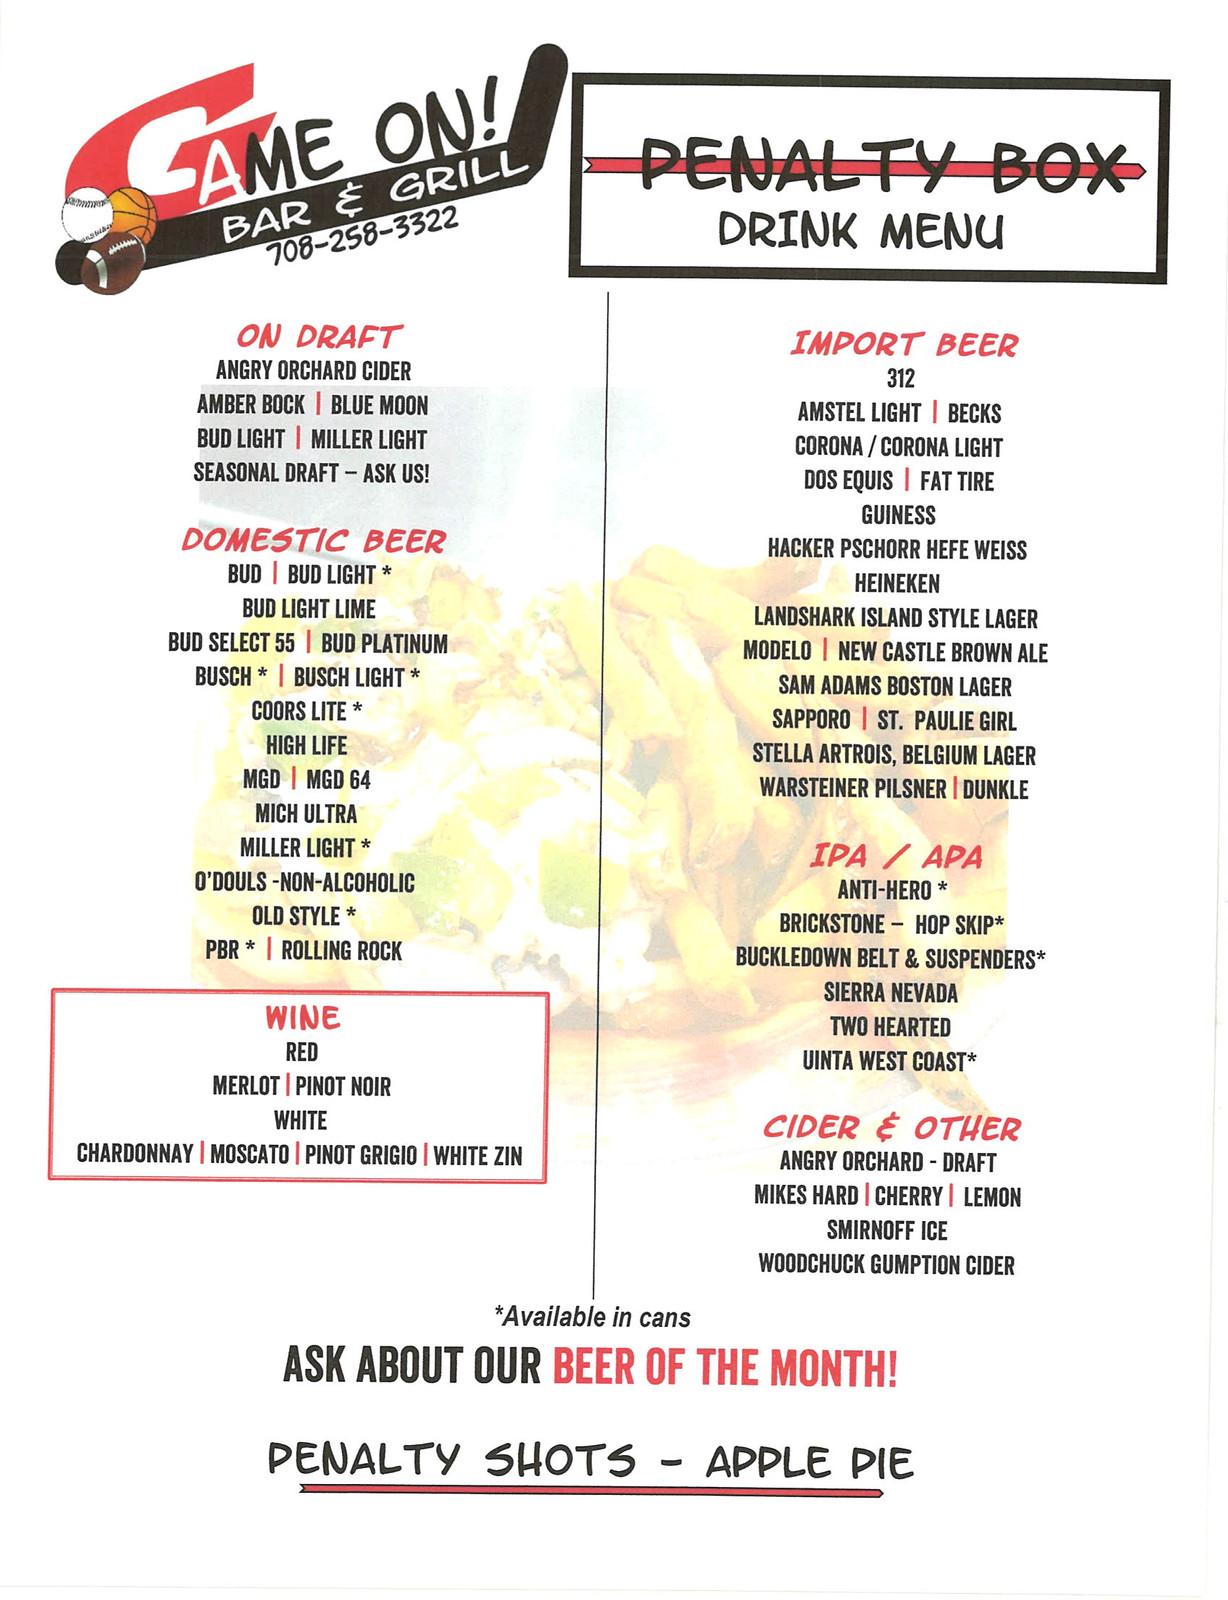 Game On Bar & Grill | Peotone | Menu